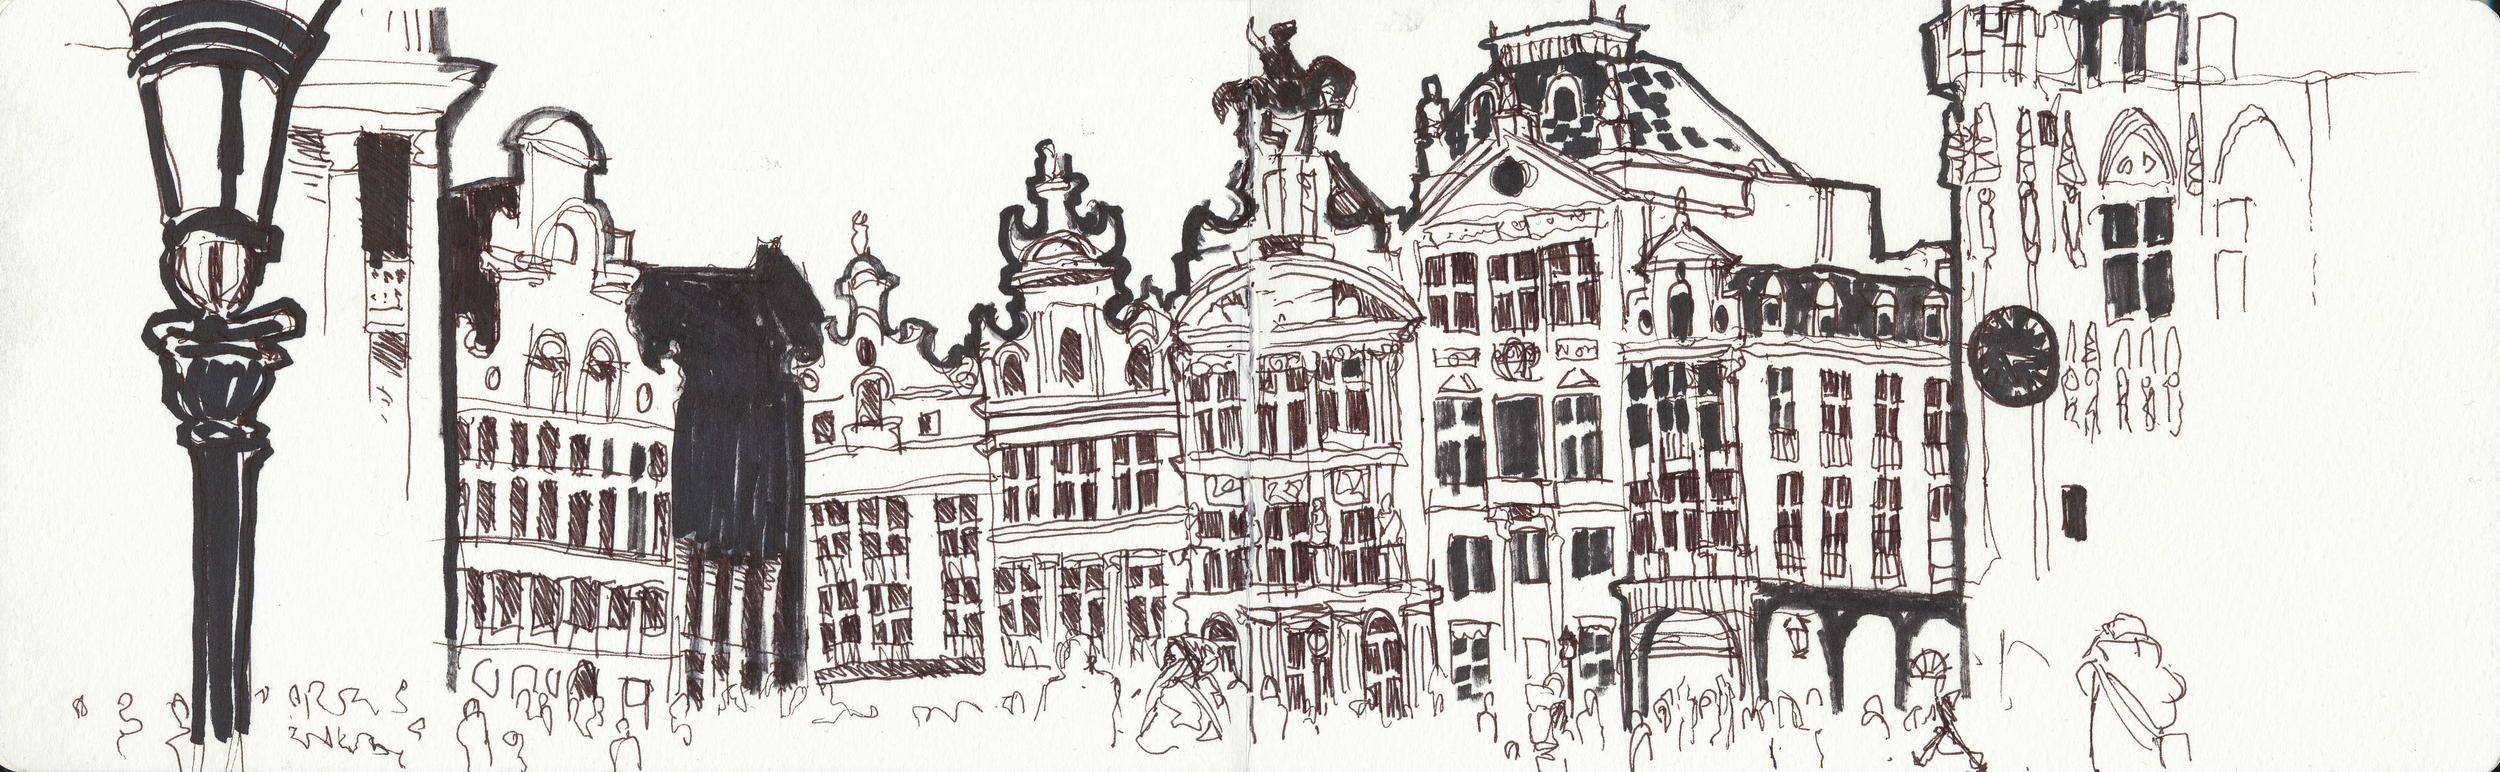 Grand place, Brussels Belgium.